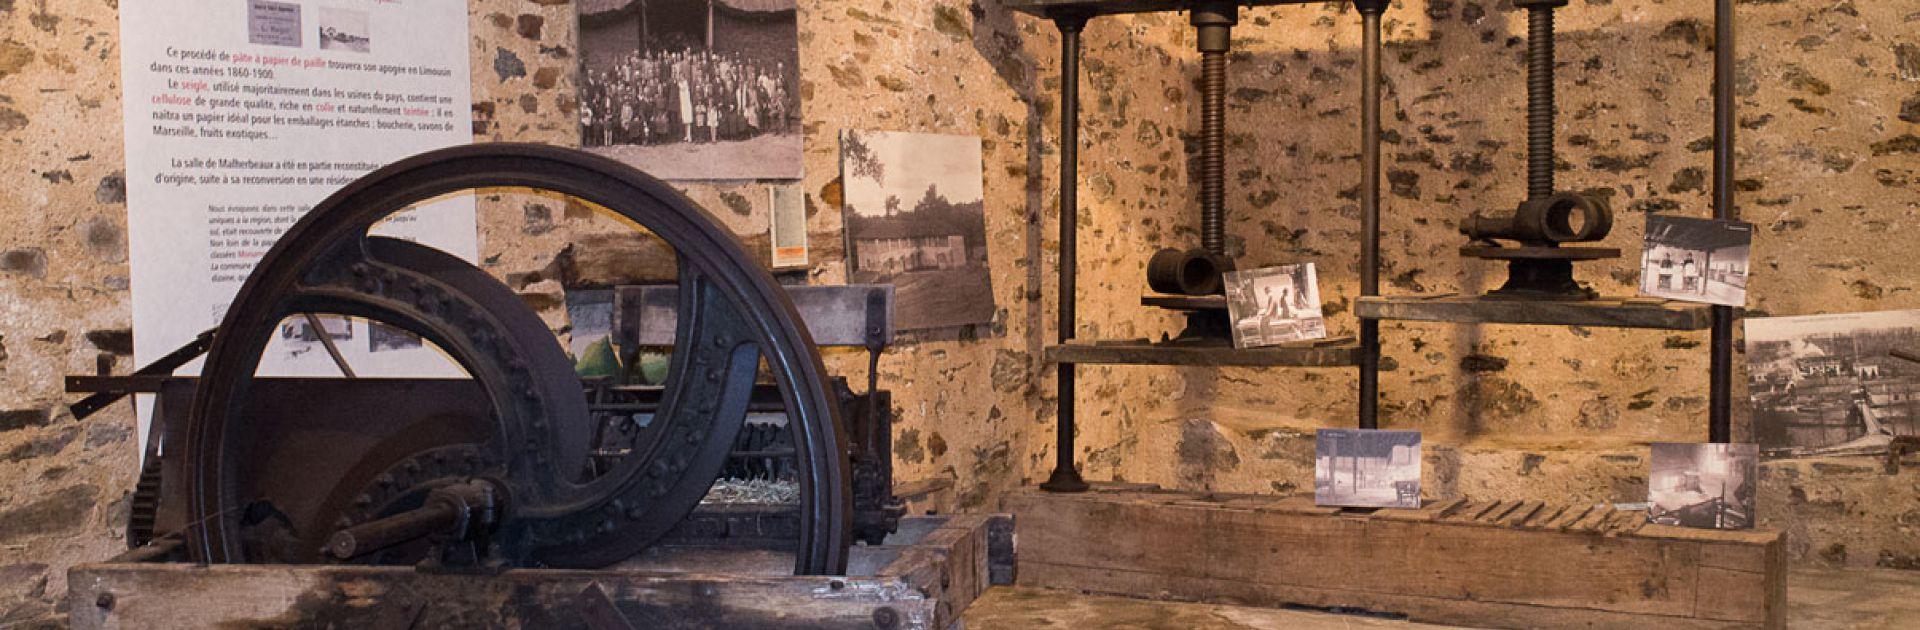 Papier water oude werktools forges staal Périgord Vert